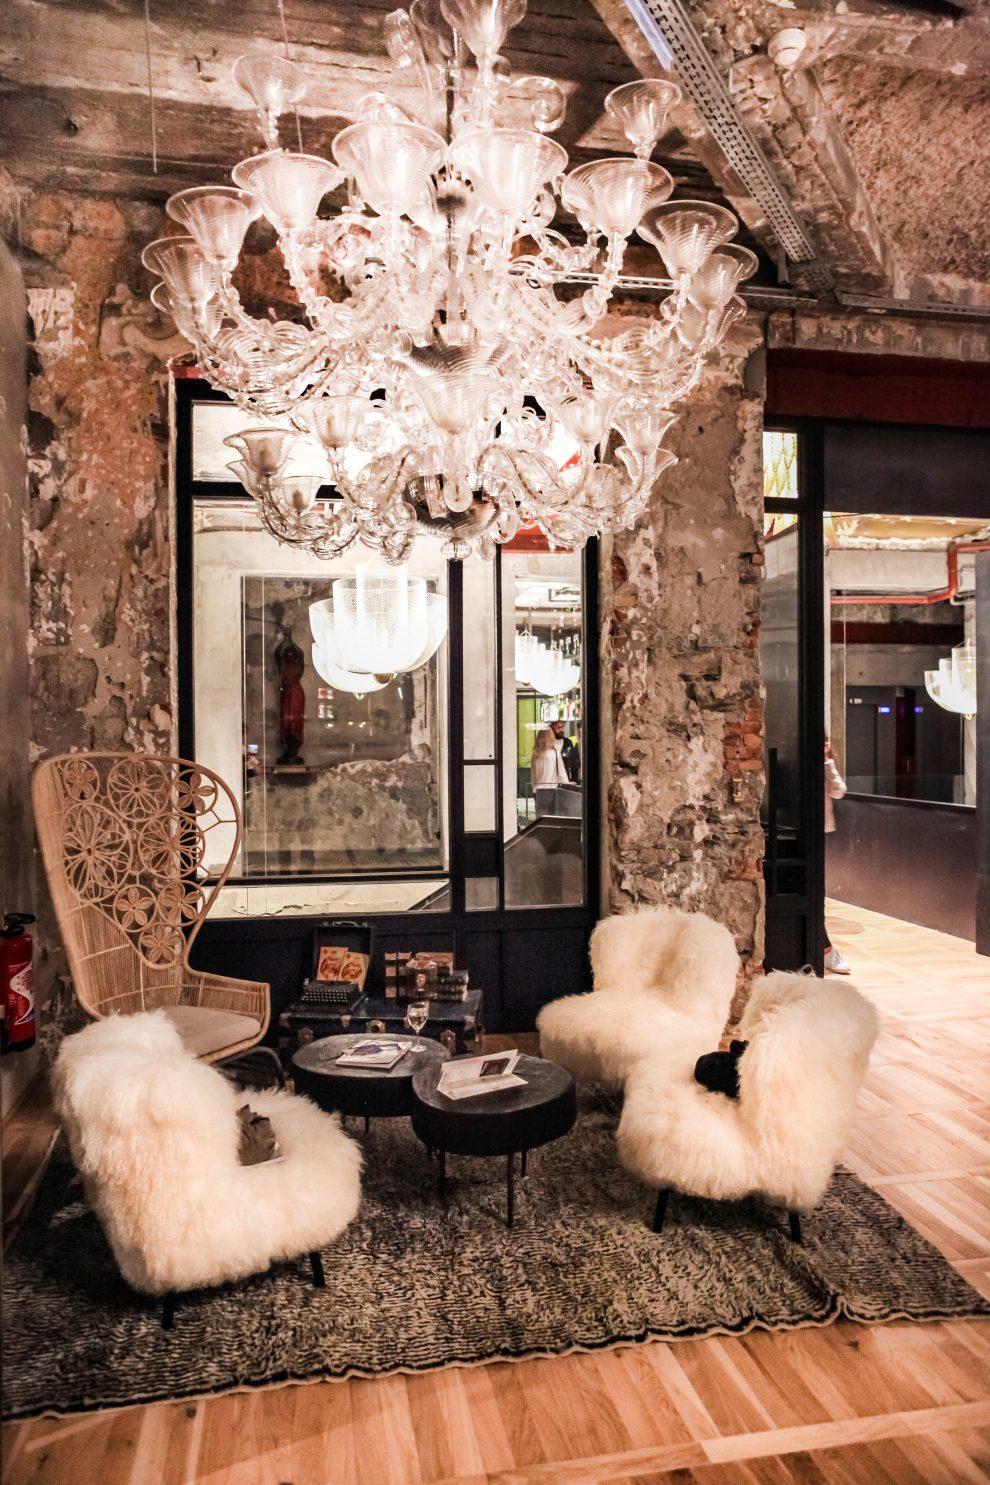 La Folie Douce hotel Chamonix - après-ski Frankrijk aanrader?